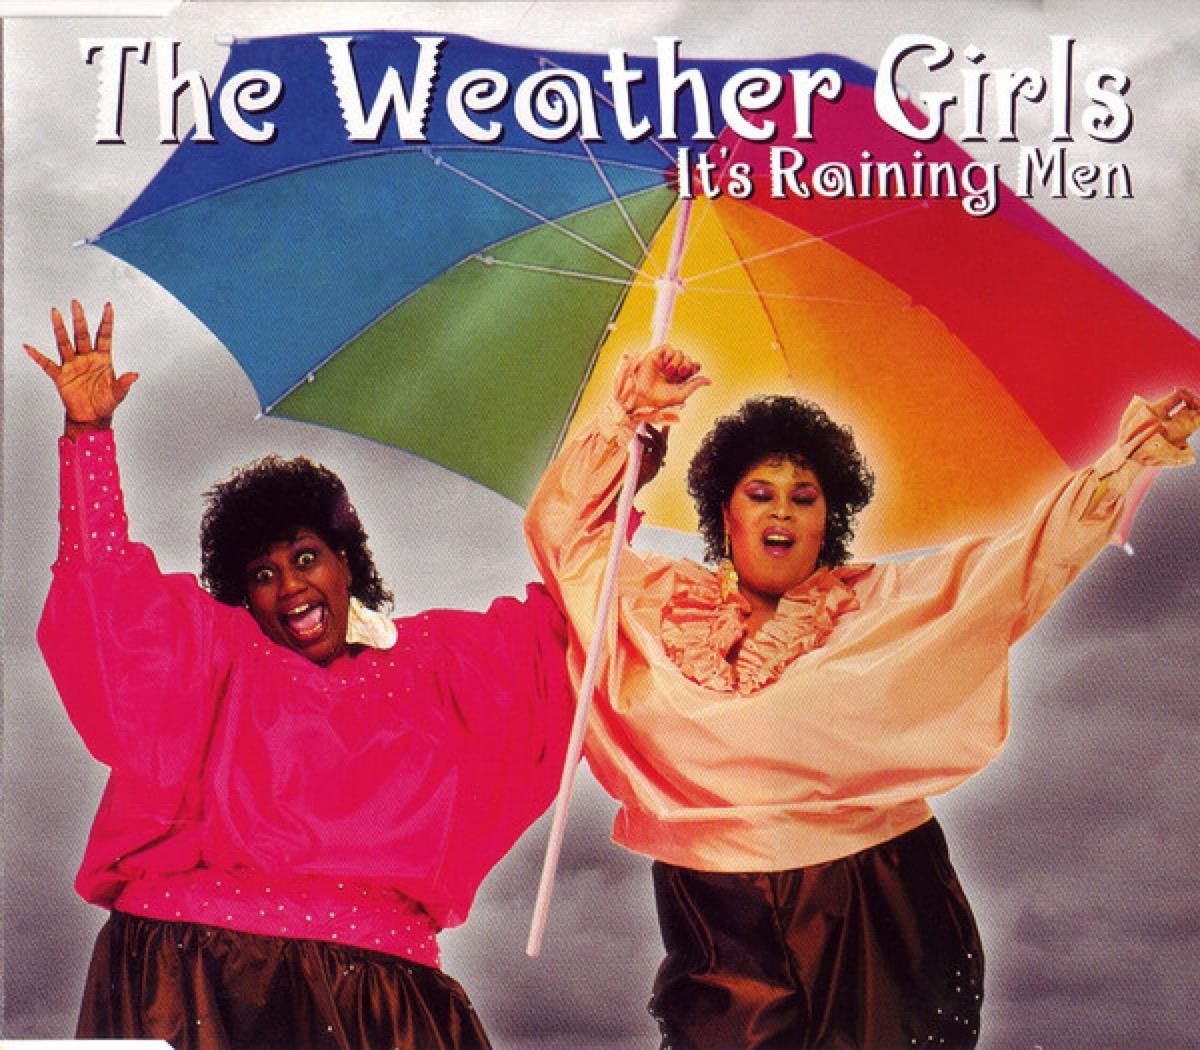 It's Raining Men The Weather Girls Best One-Hit Wonders